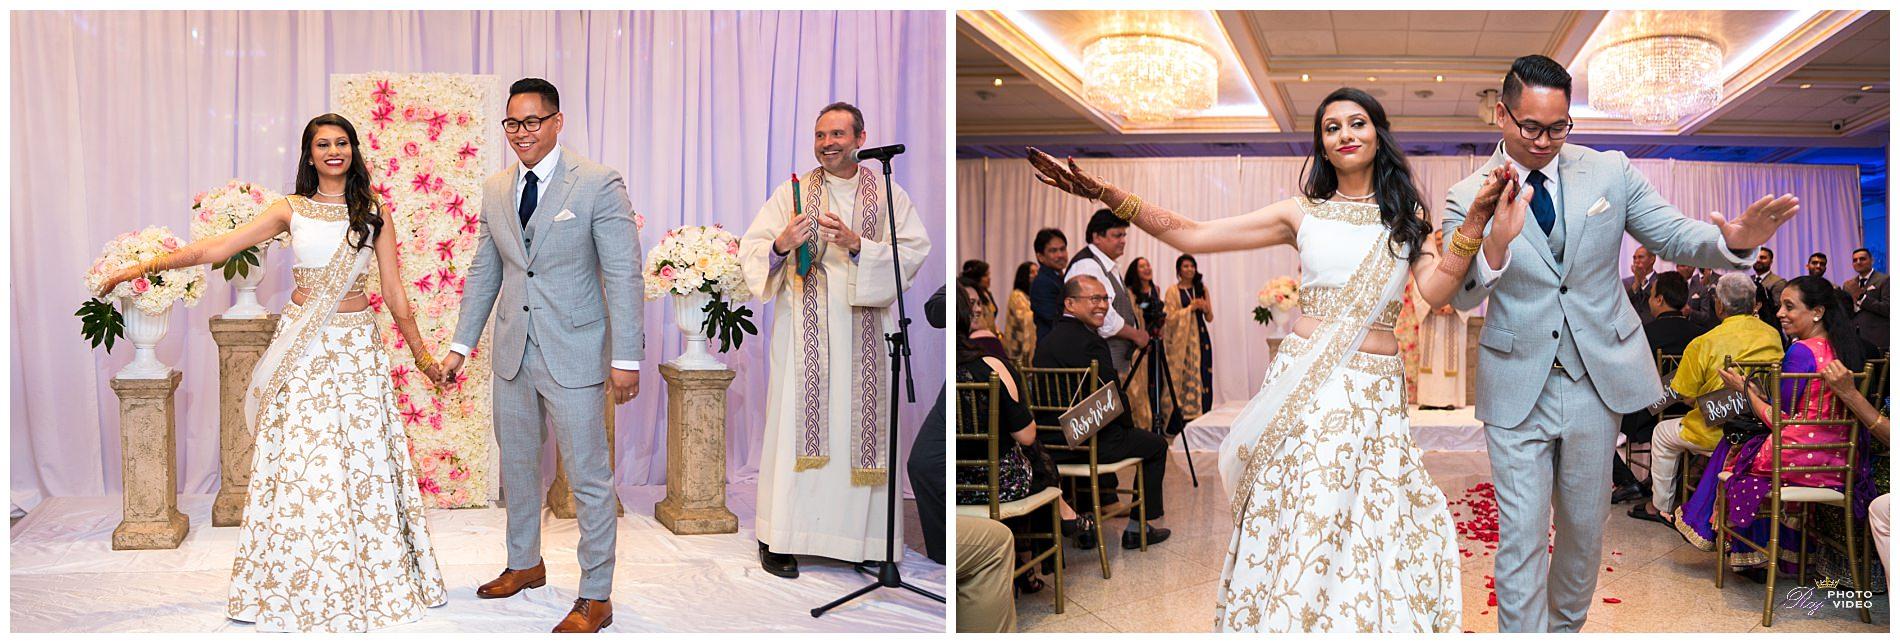 Royal-Manor-Garfield-NJ-Christian-Wedding-Ceremony-Khusbu-Jeff-53.jpg